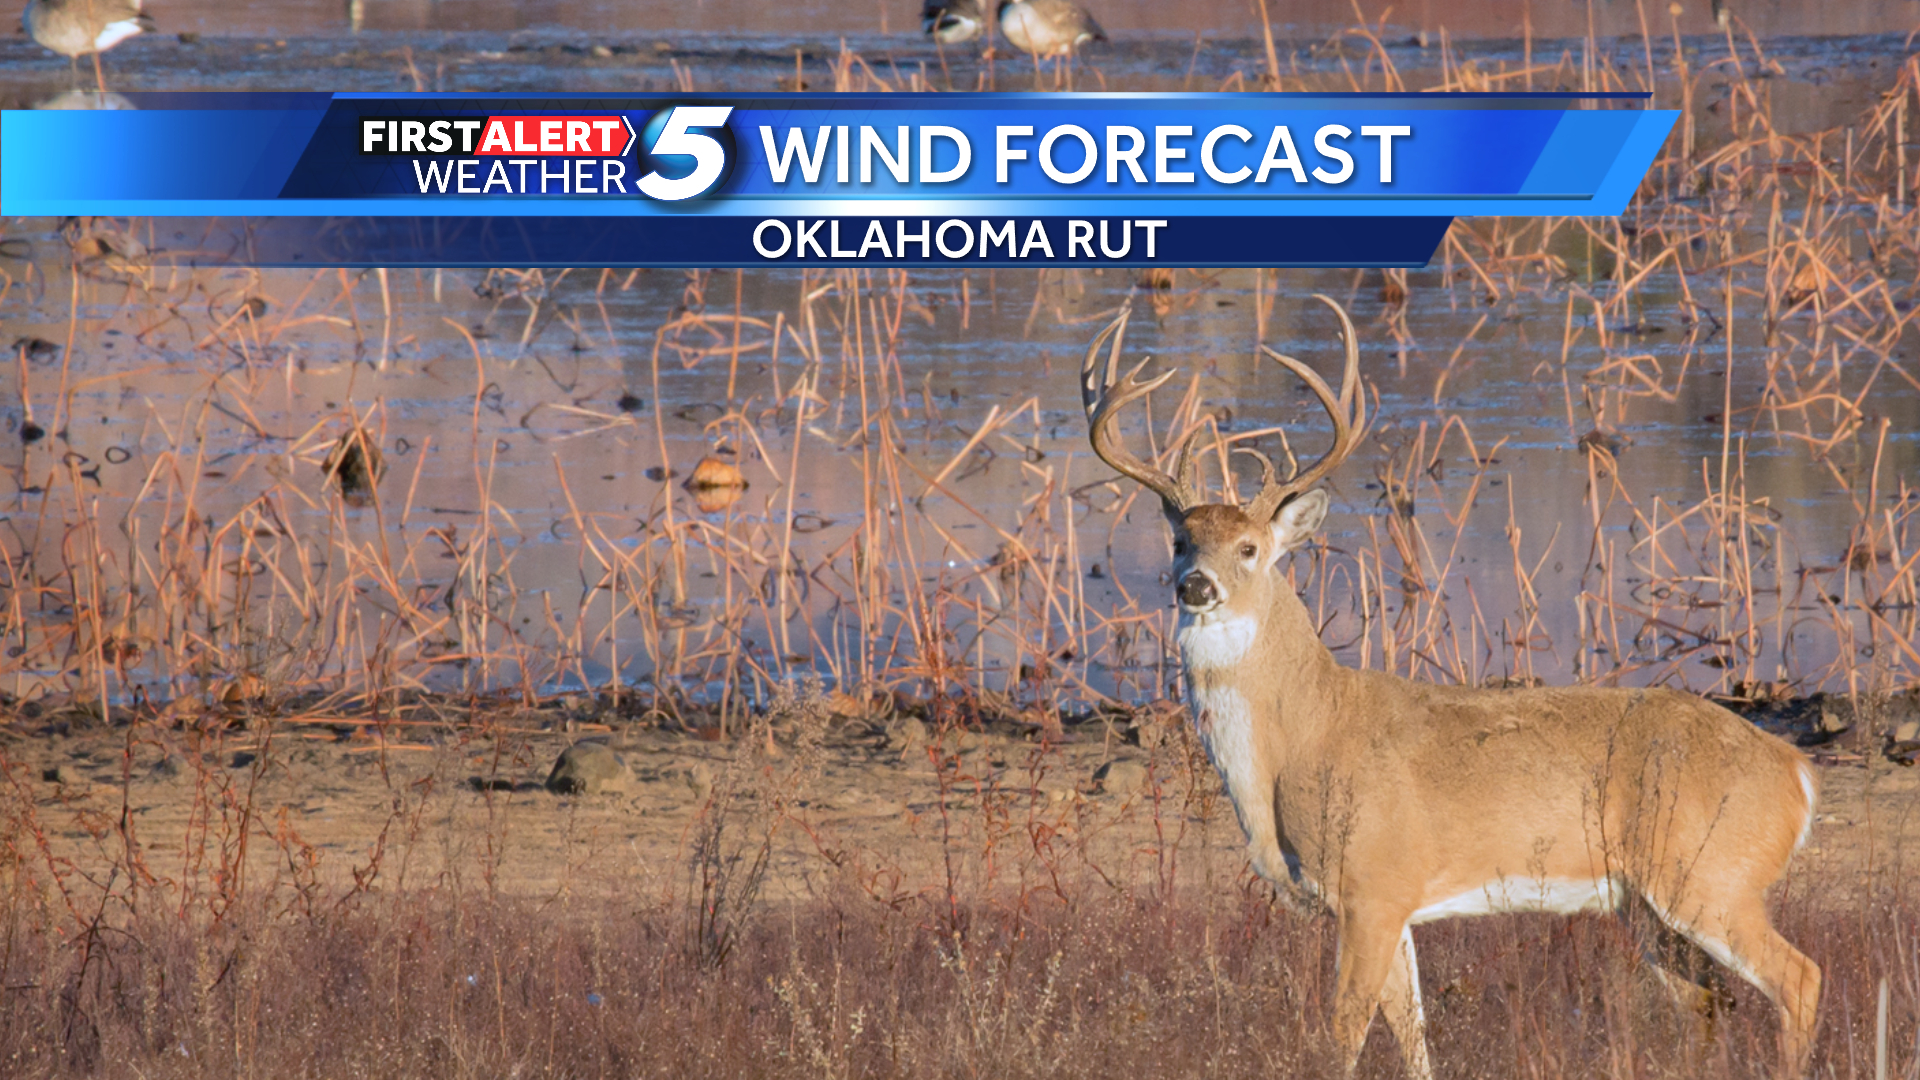 Oklahoma Whitetail Deer Rut Wind Forecast - Oklahoma City  Deer Rut In Ny